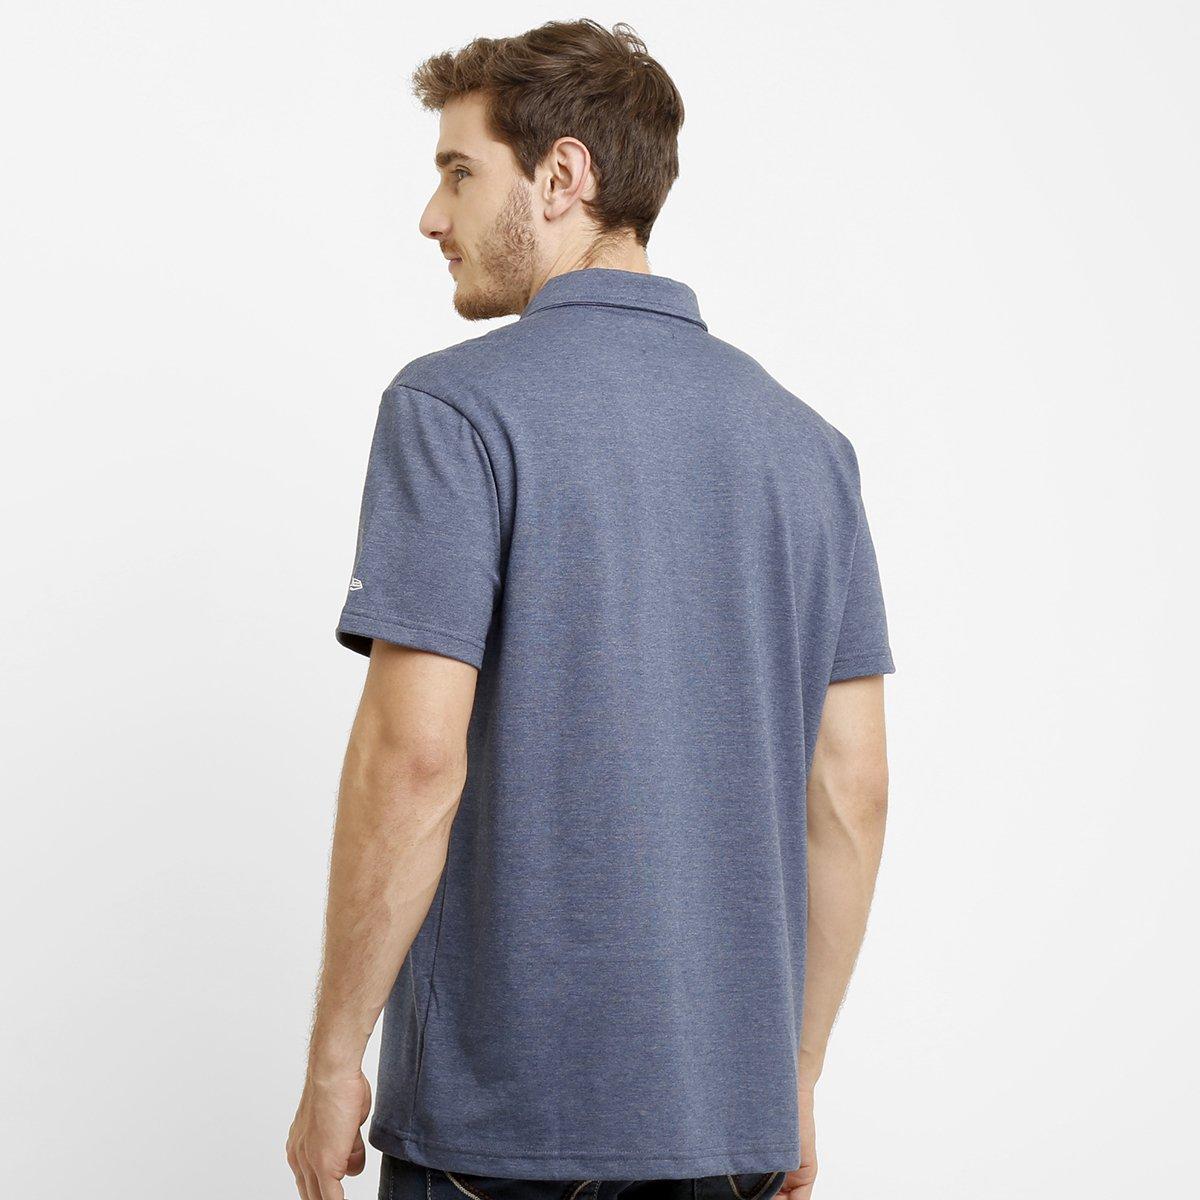 Camisa Polo New Era Basic Malhao NFL - Compre Agora  87e25ea926cbf